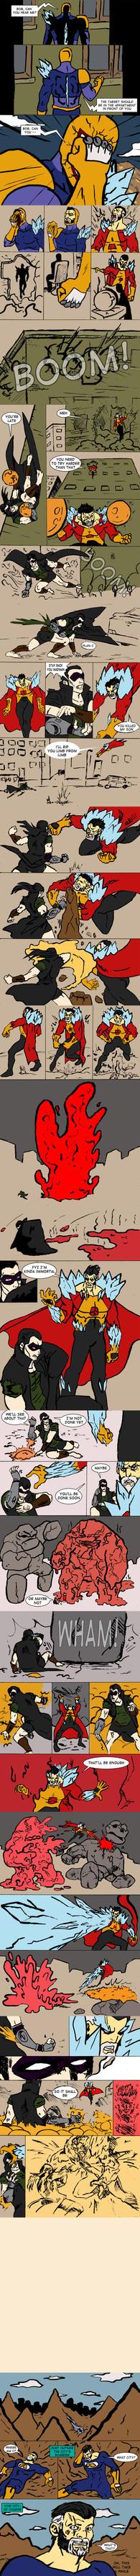 16b Awesome Revenge part 2 by Wolcik